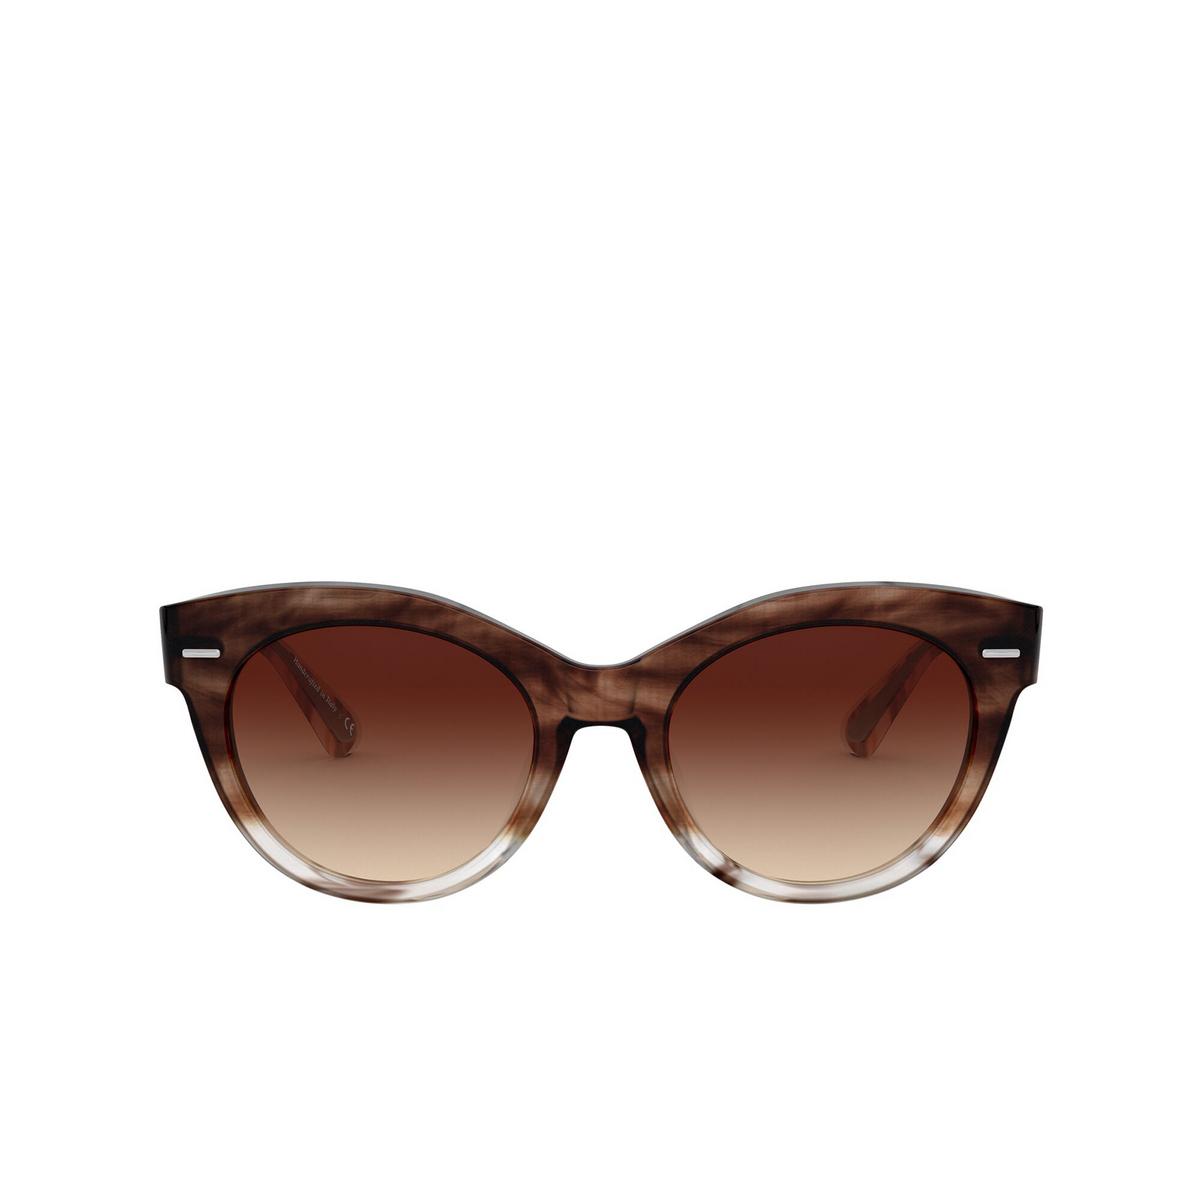 Oliver Peoples® Round Sunglasses: Georgica OV5421SU color Brick Ombre 168513 - front view.